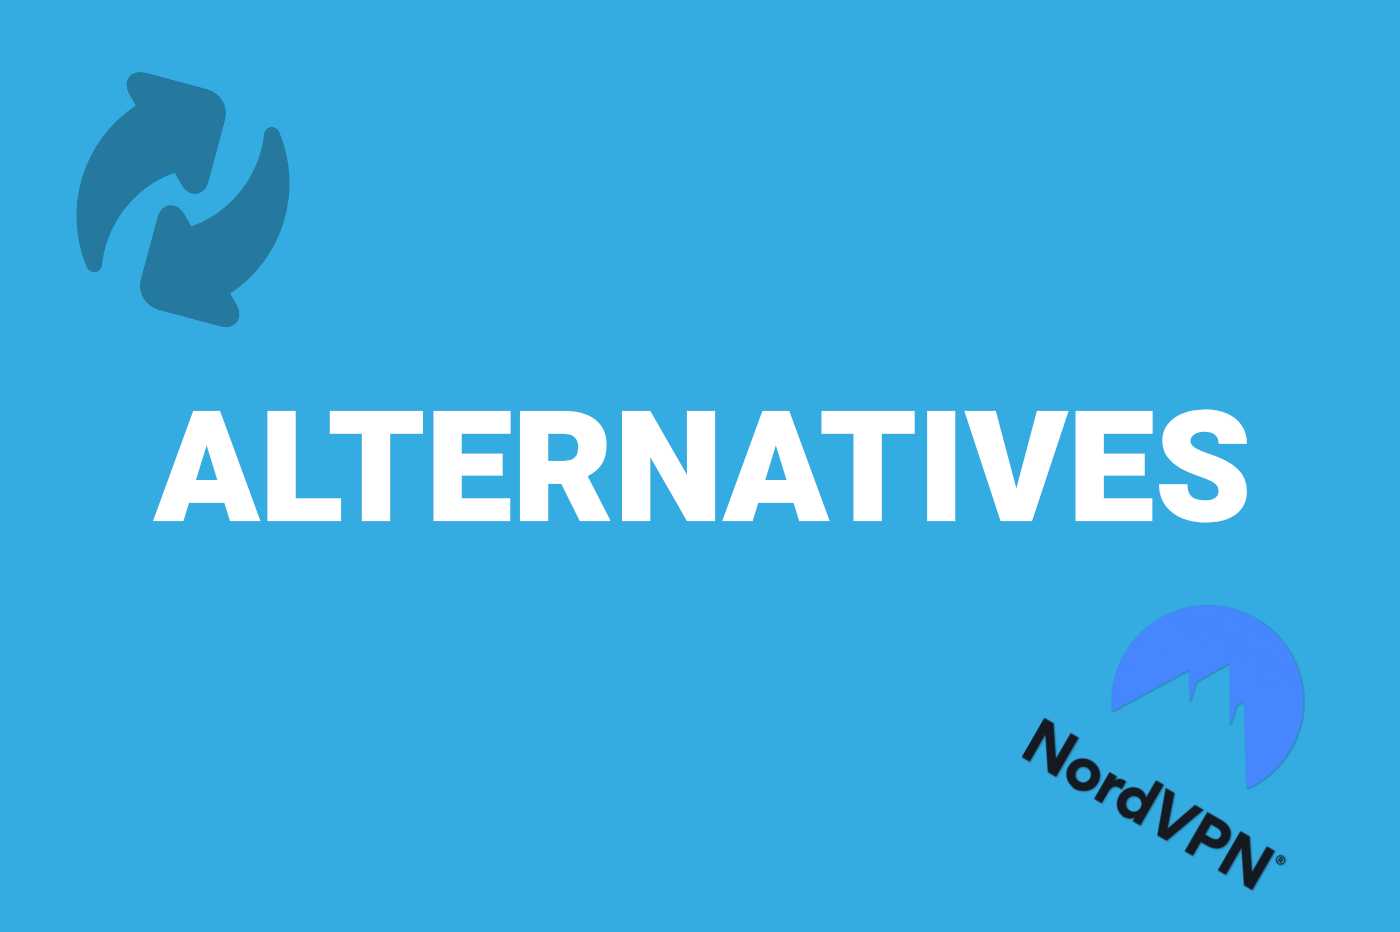 Alternatives NordVPN